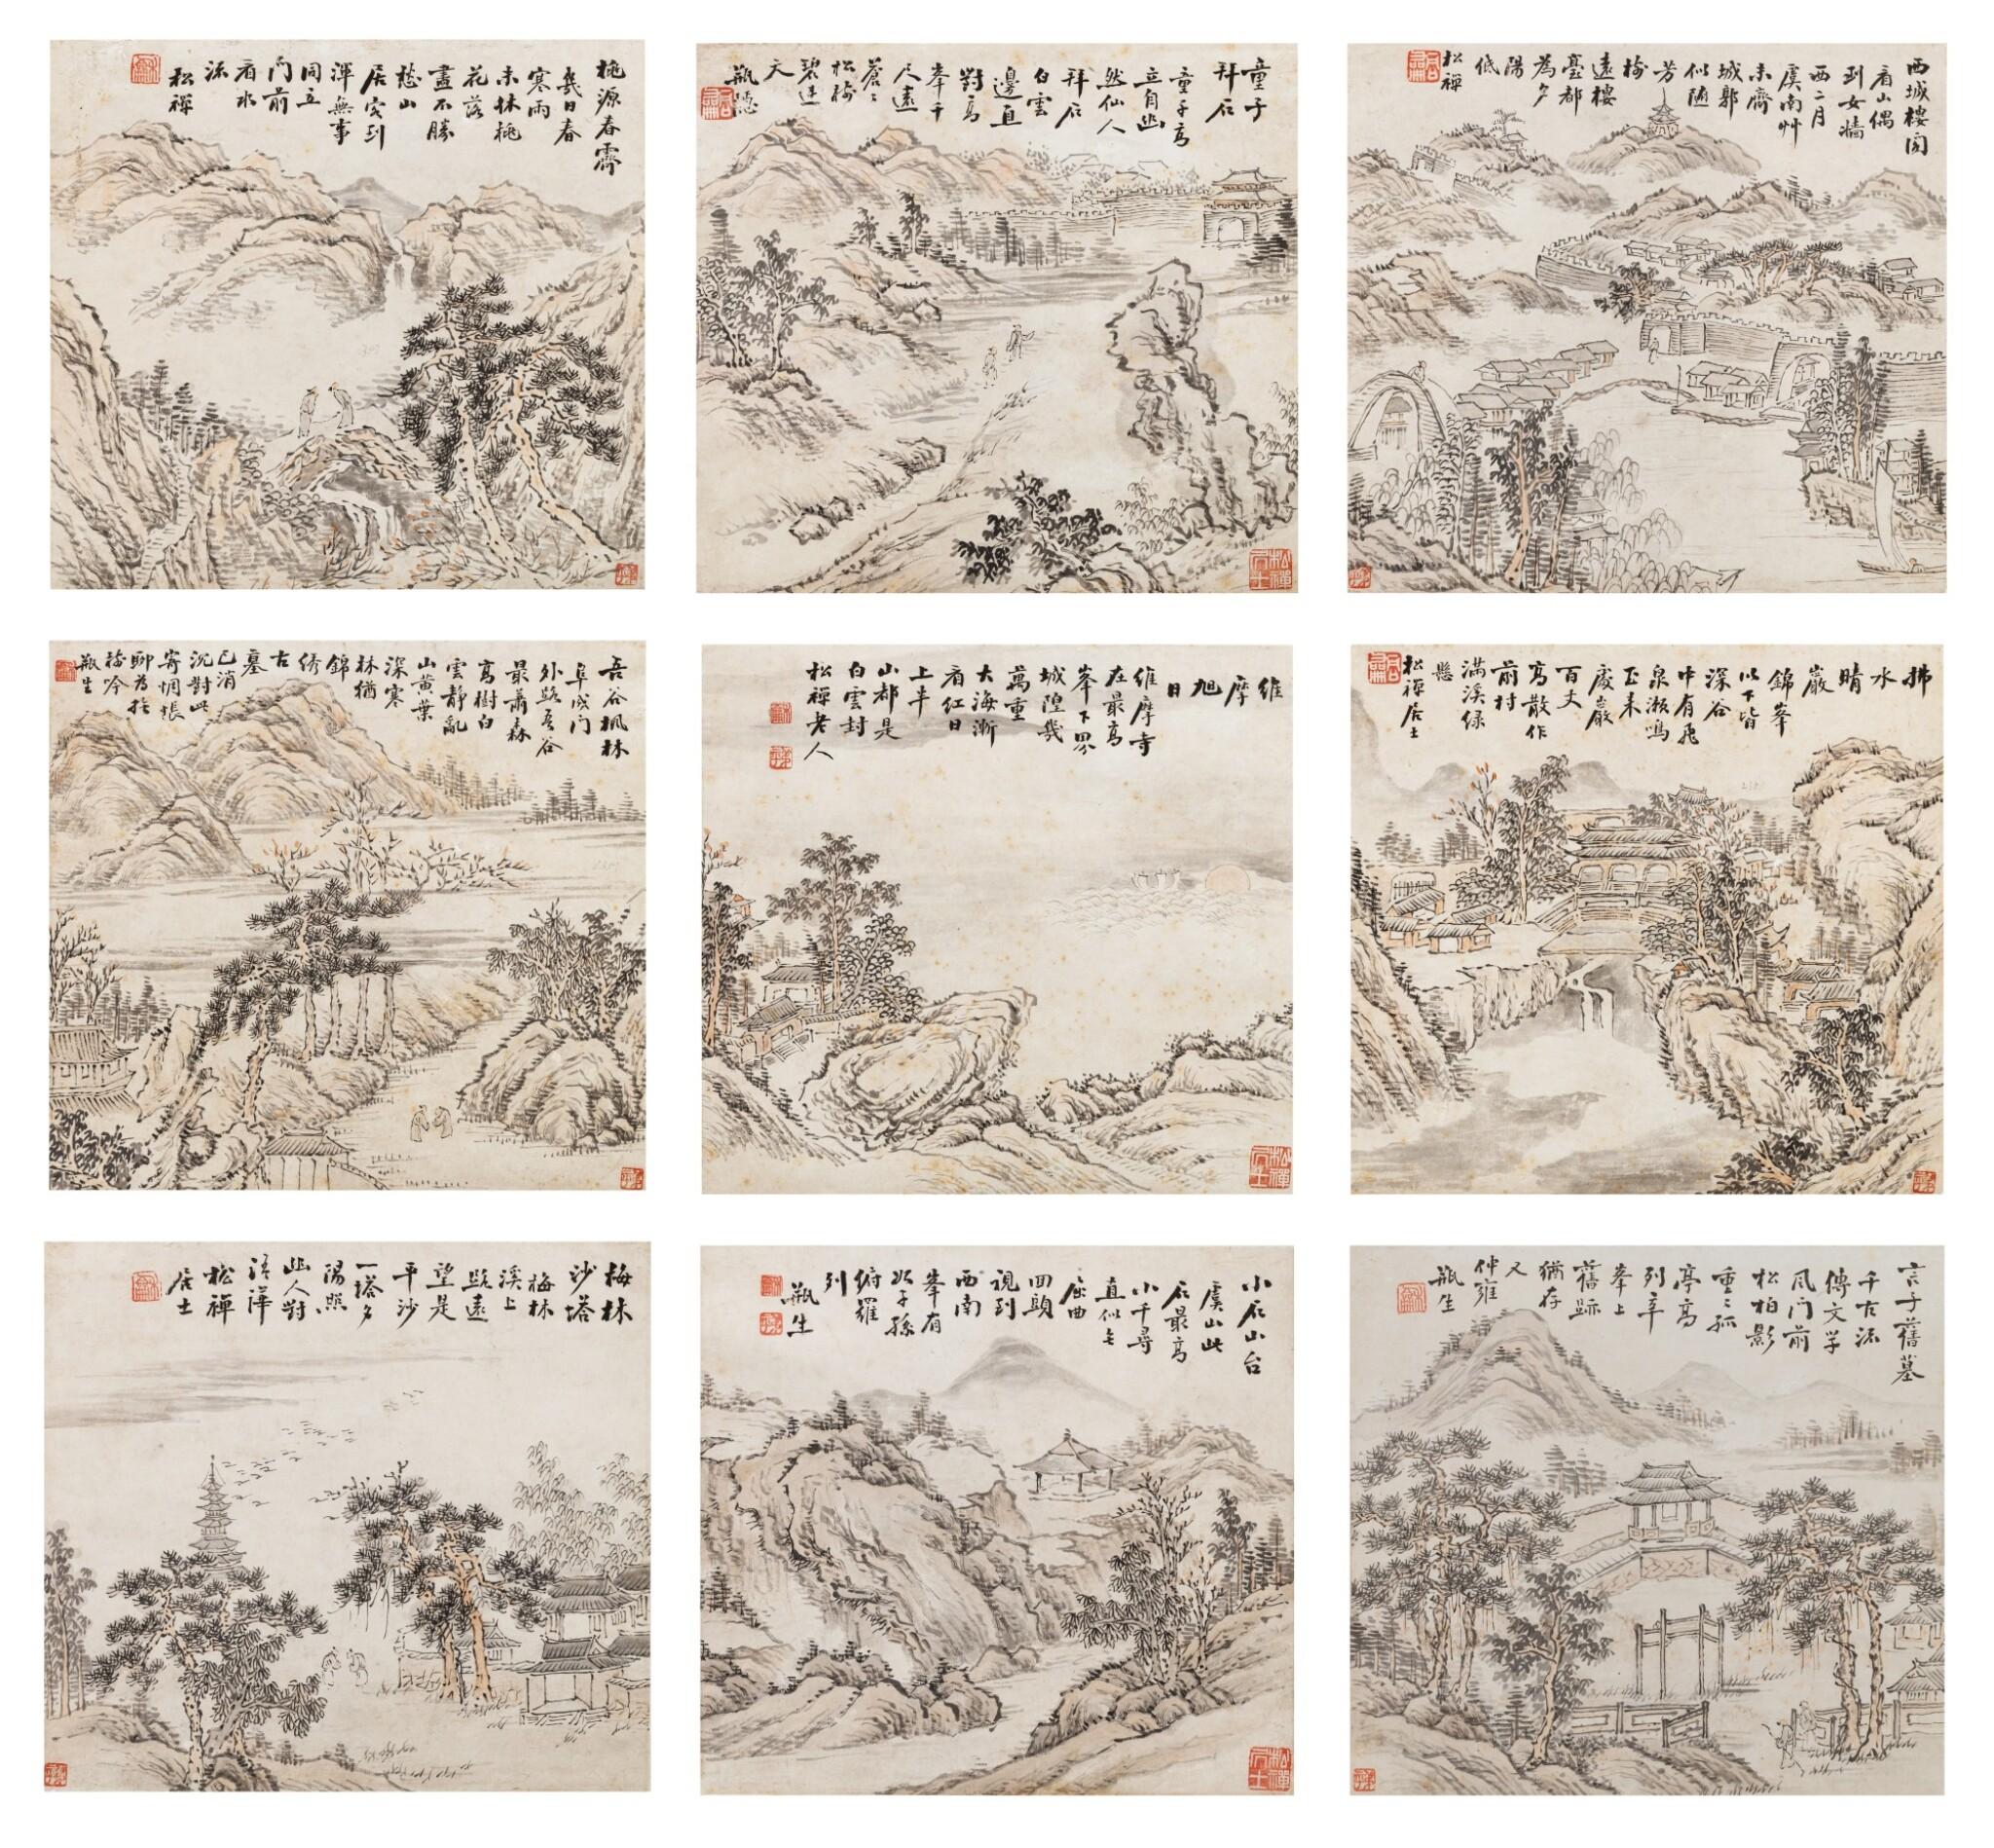 View 1 of Lot 121. Weng Tonghe (1830-1904) Ensemble de neuf peintures de paysage | 翁同龢 山水圖 一組九幀 | Weng Tonghe (1830-1904) Set of Nine Landscapes, ink and colour on paper, hanging scrolls.